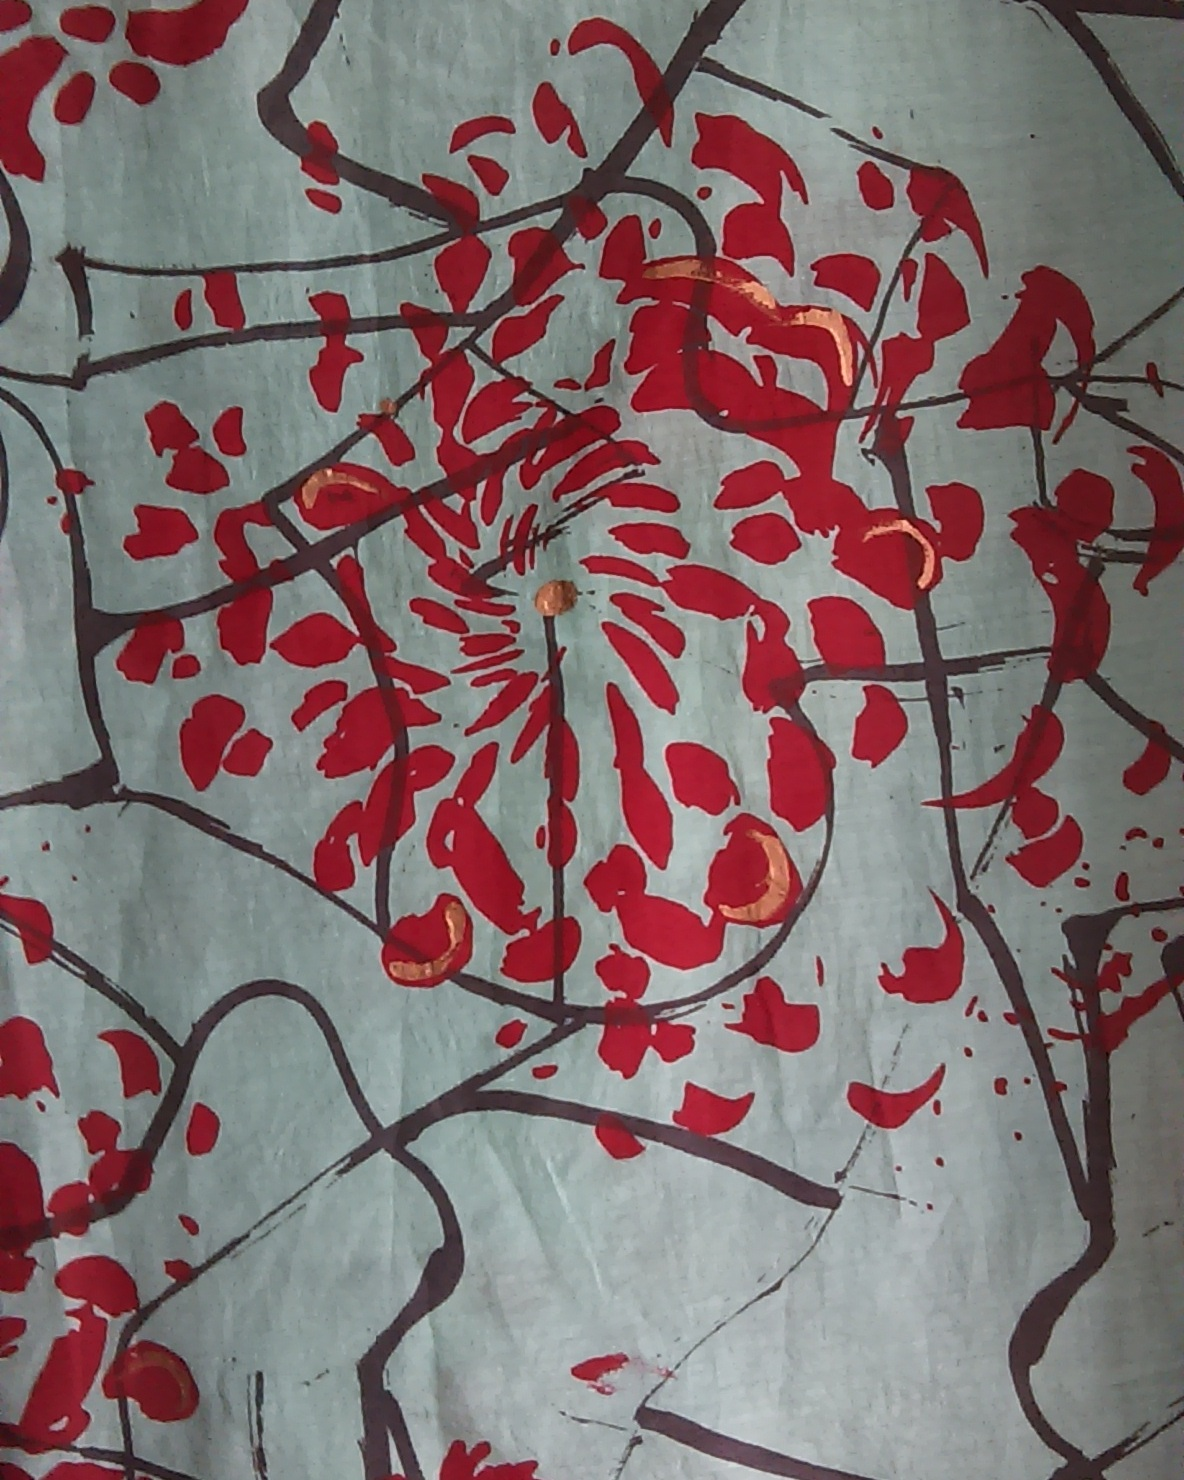 jadesign-botanica-2207.jpg